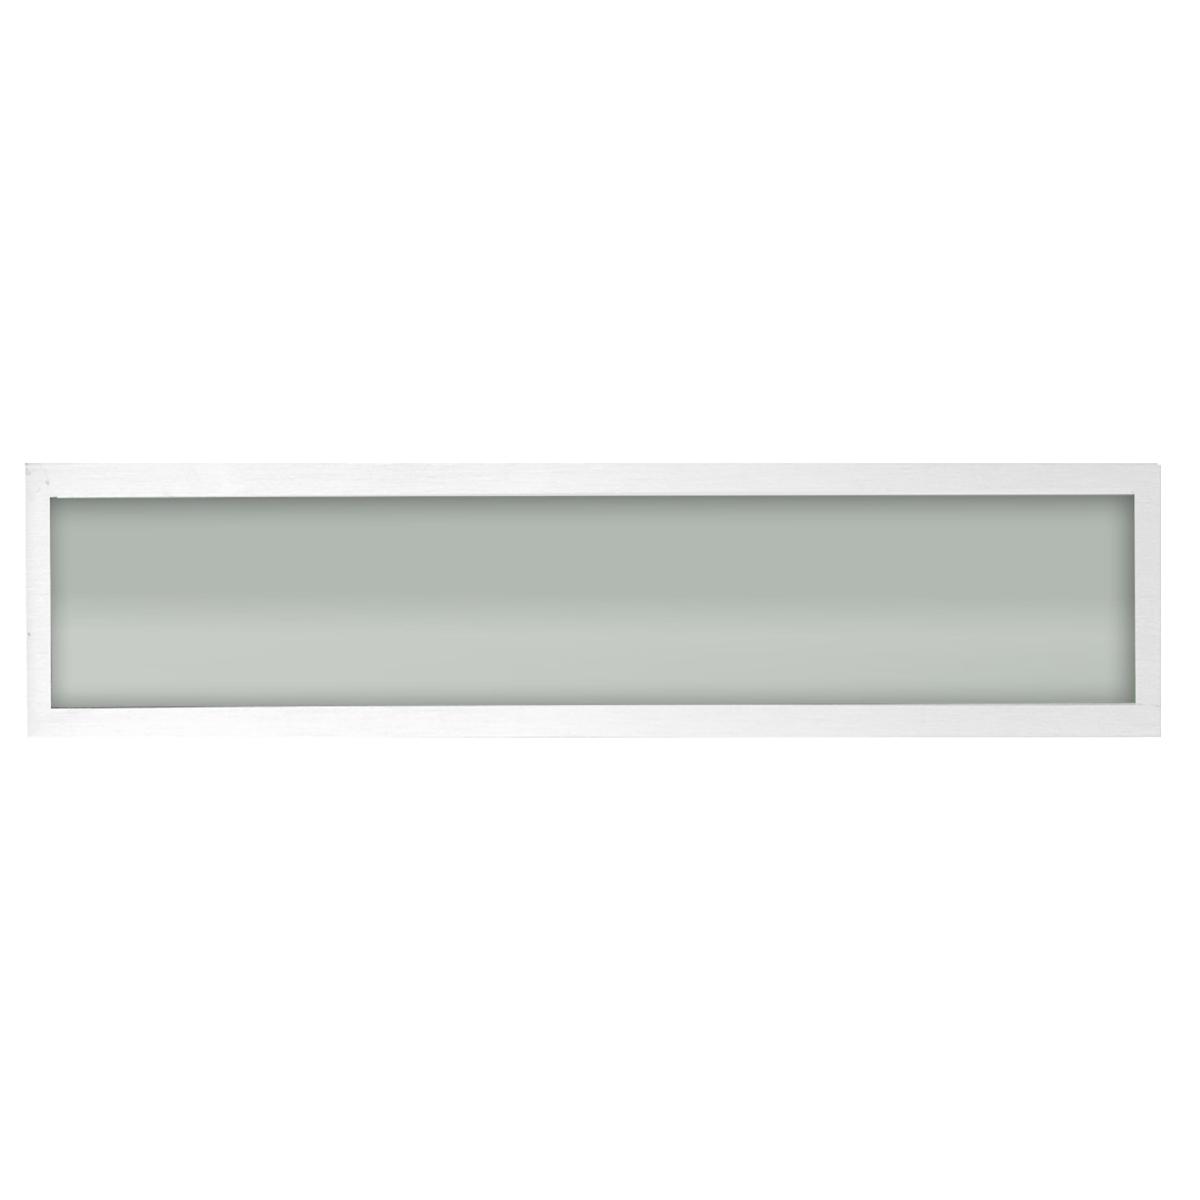 Plafon Space Sobr. Ret.   35cm Alum. Vidro Fosco E-27 2 Lamp. Max 60w Branco